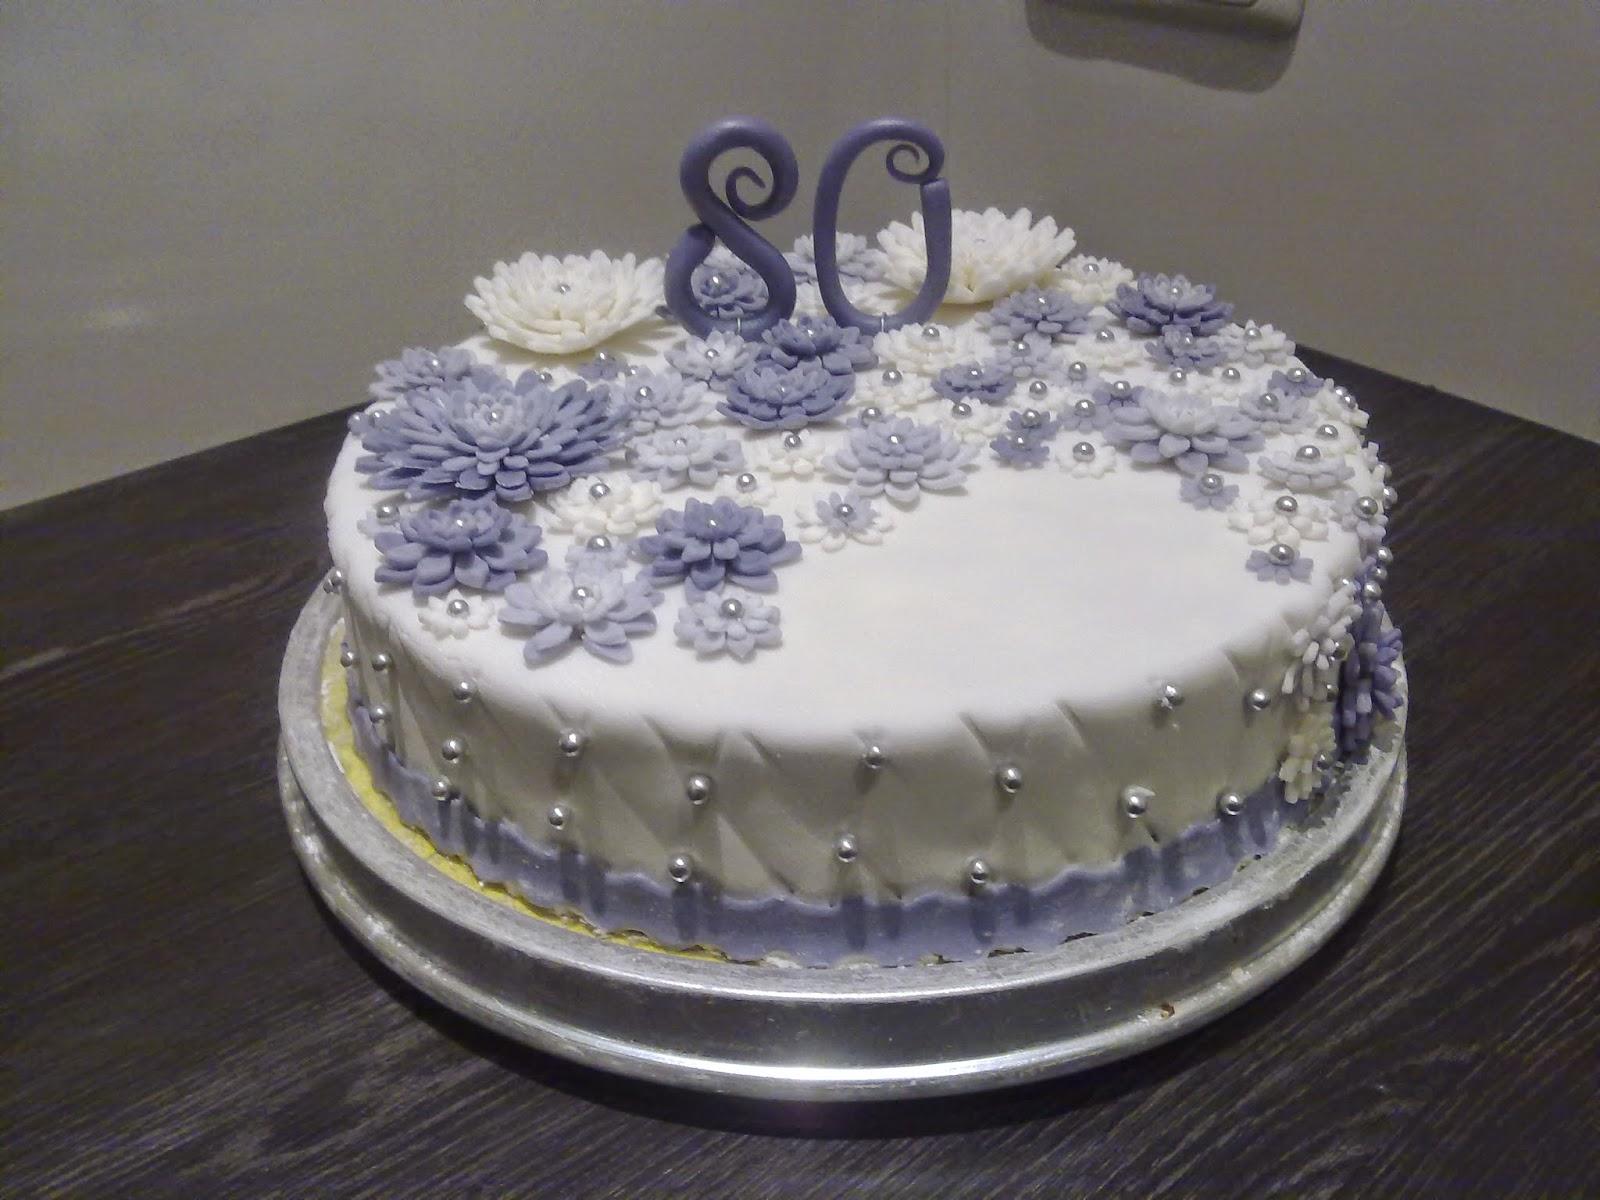 Fondant Kuchen Zum 60 Geburtstag Hylen Maddawards Com